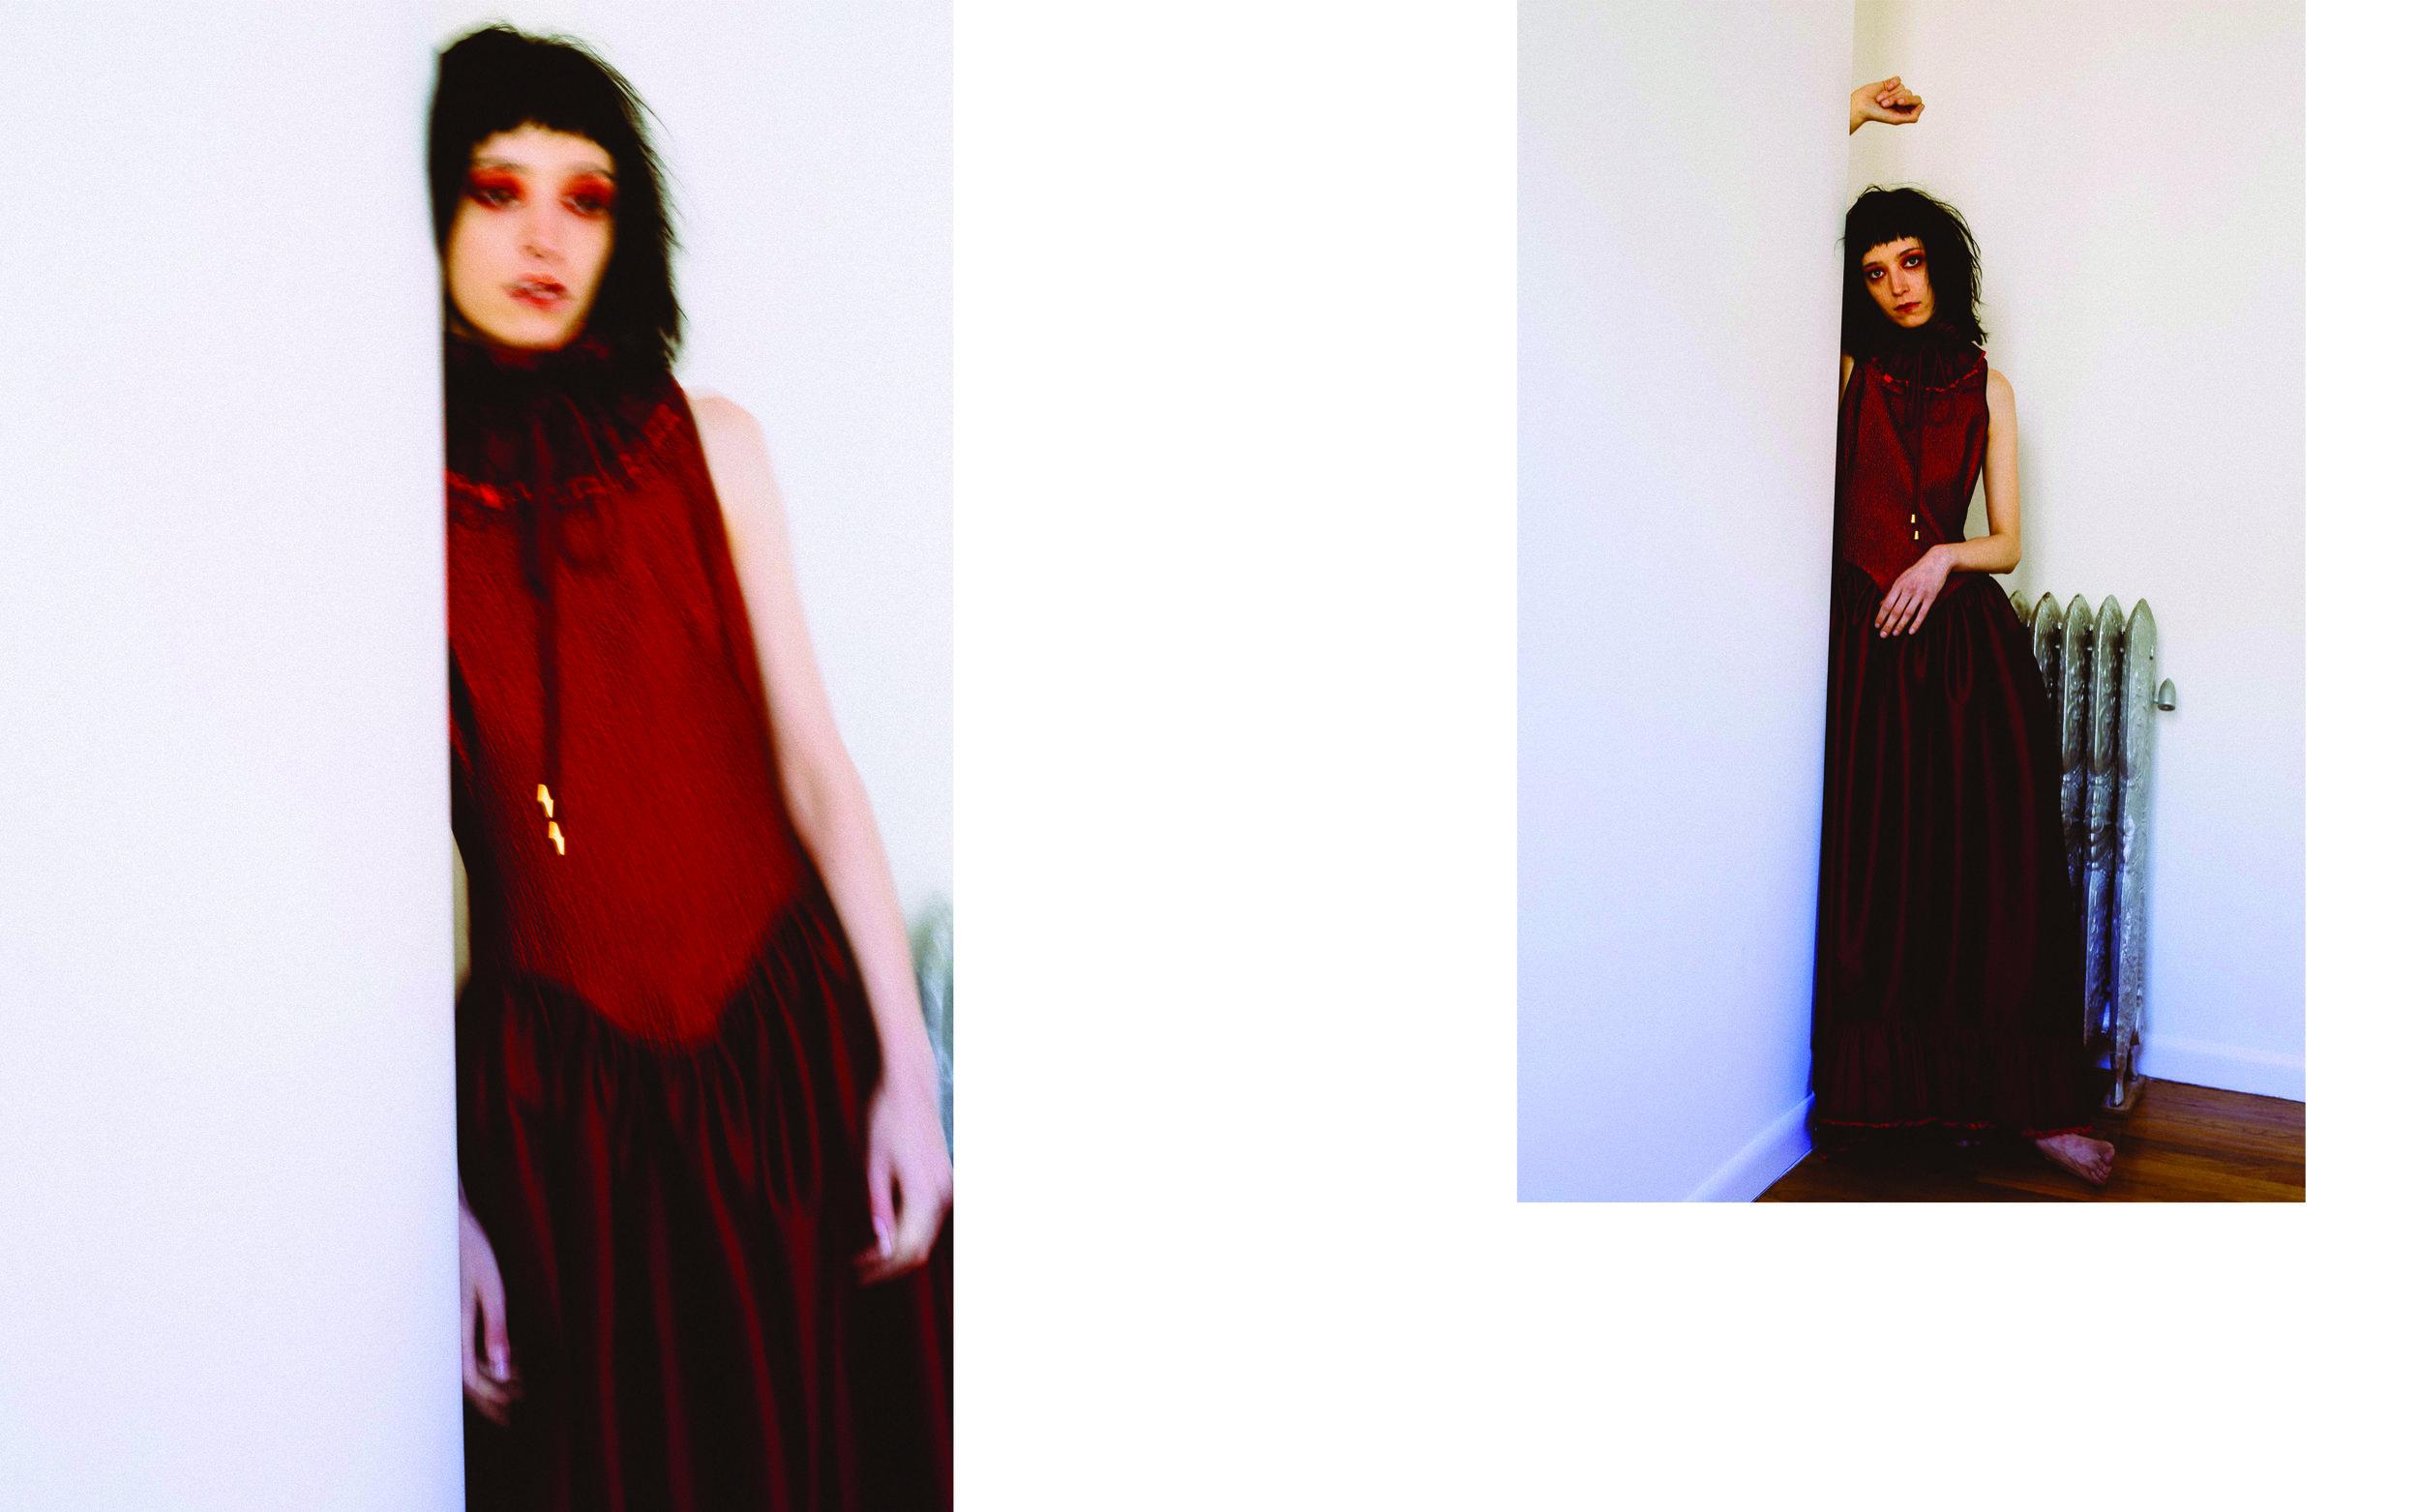 kelsey randall red hammered silk and taffeta raw ruffle hem bustle gown dress sleeveless neck ruff collar detachable